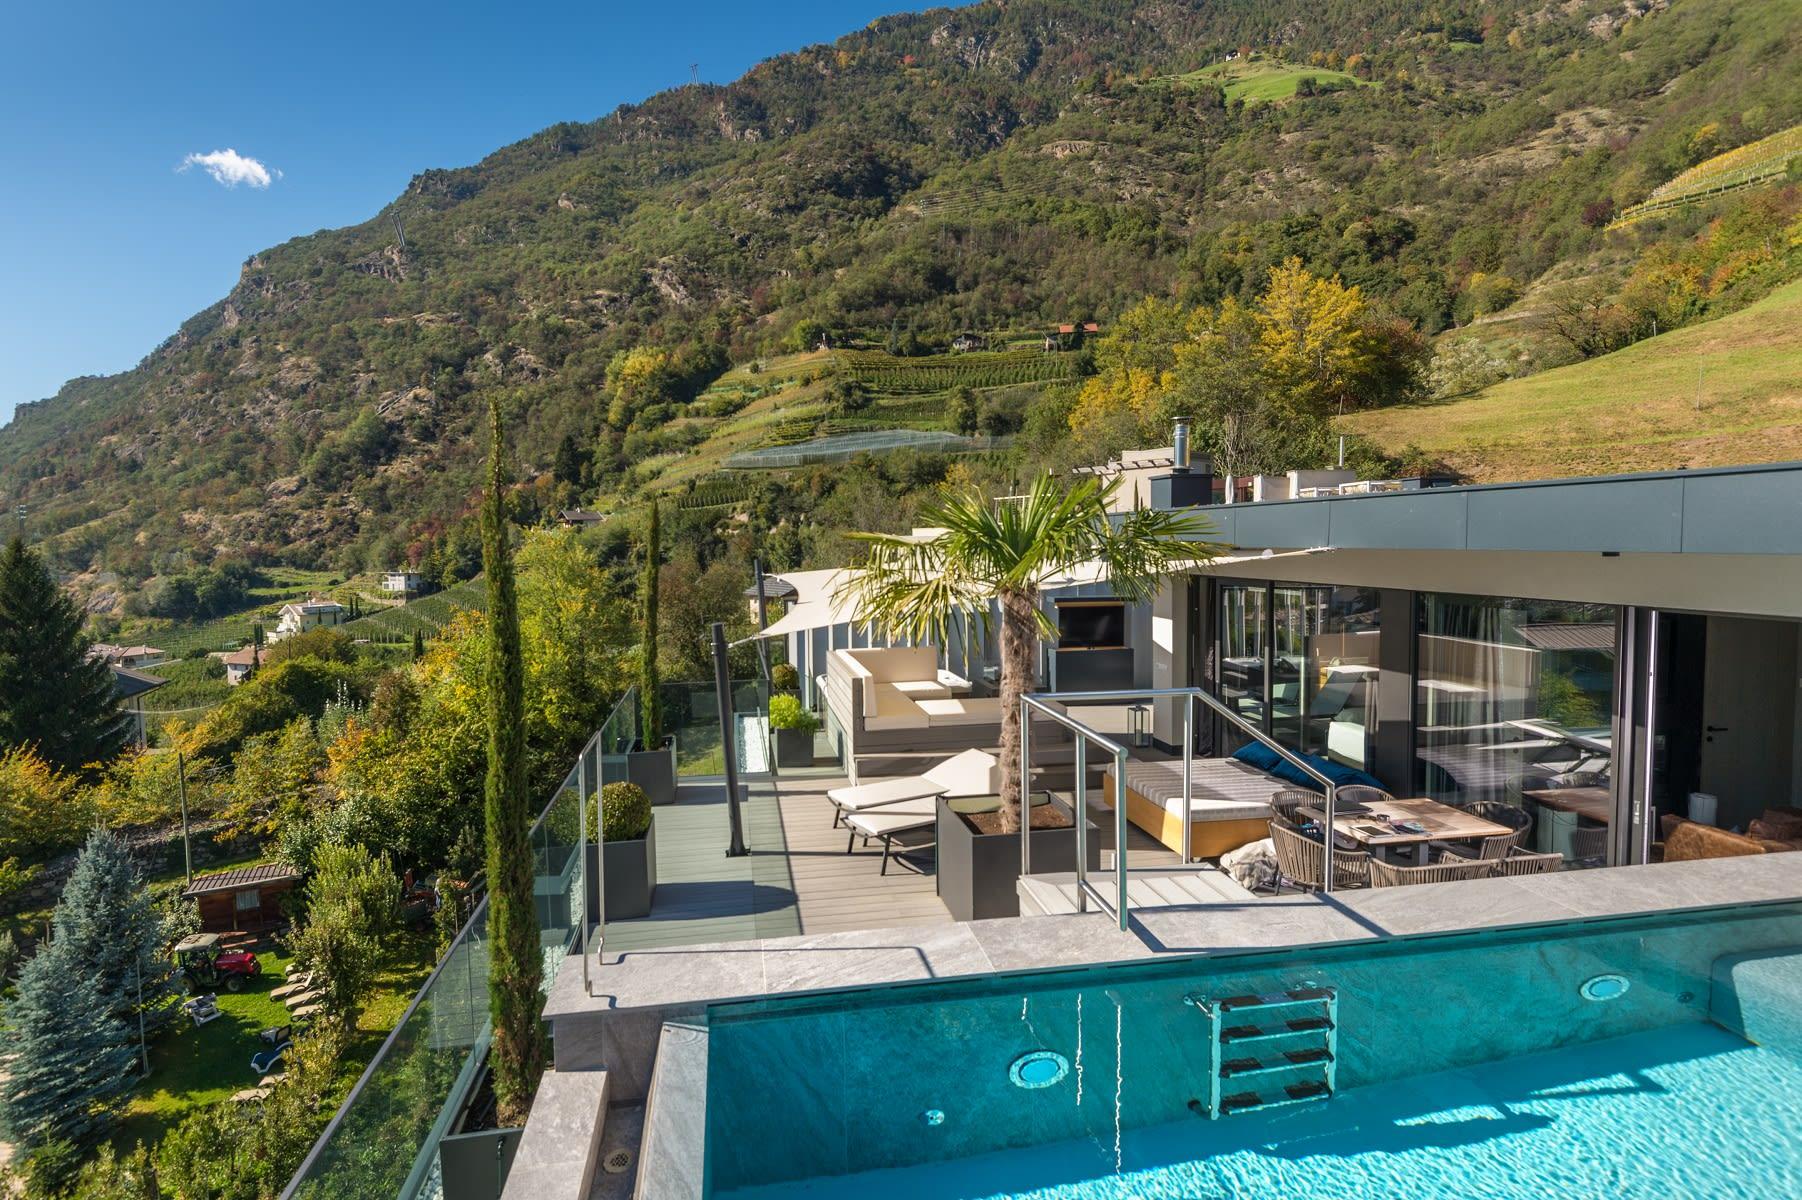 Penthouse Suite DolceVita Premium terrace